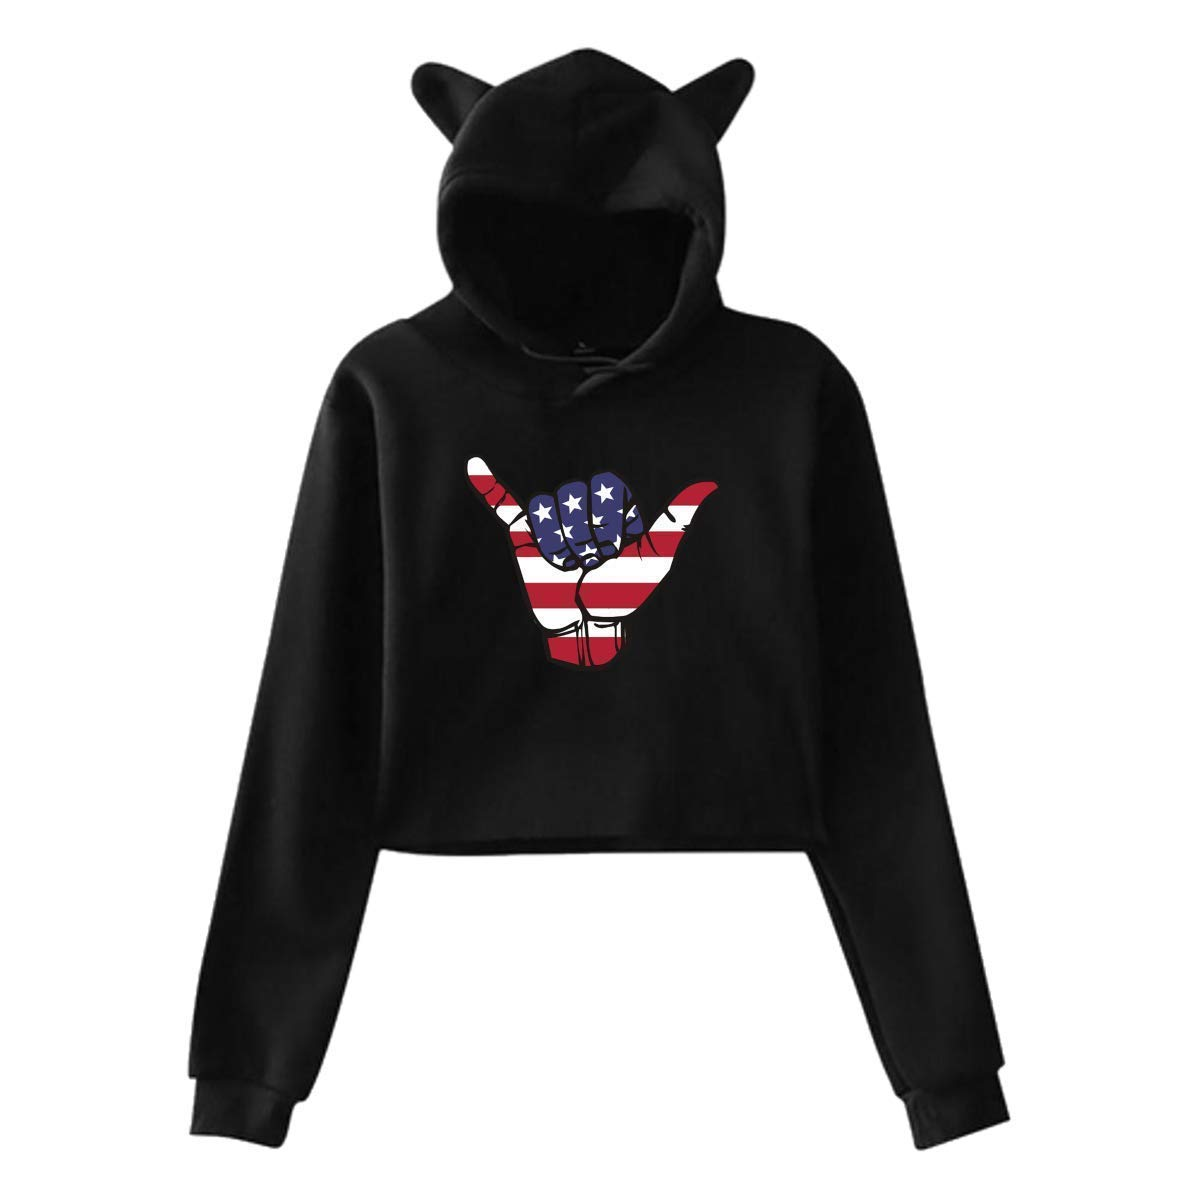 American Flag of Hand,Cat Ear Hoodie Sweatshirts,Midriff-Baring Hoody Sweater Womens Sexy Stylish Hoodie Sweater Girls Cute Hoodies